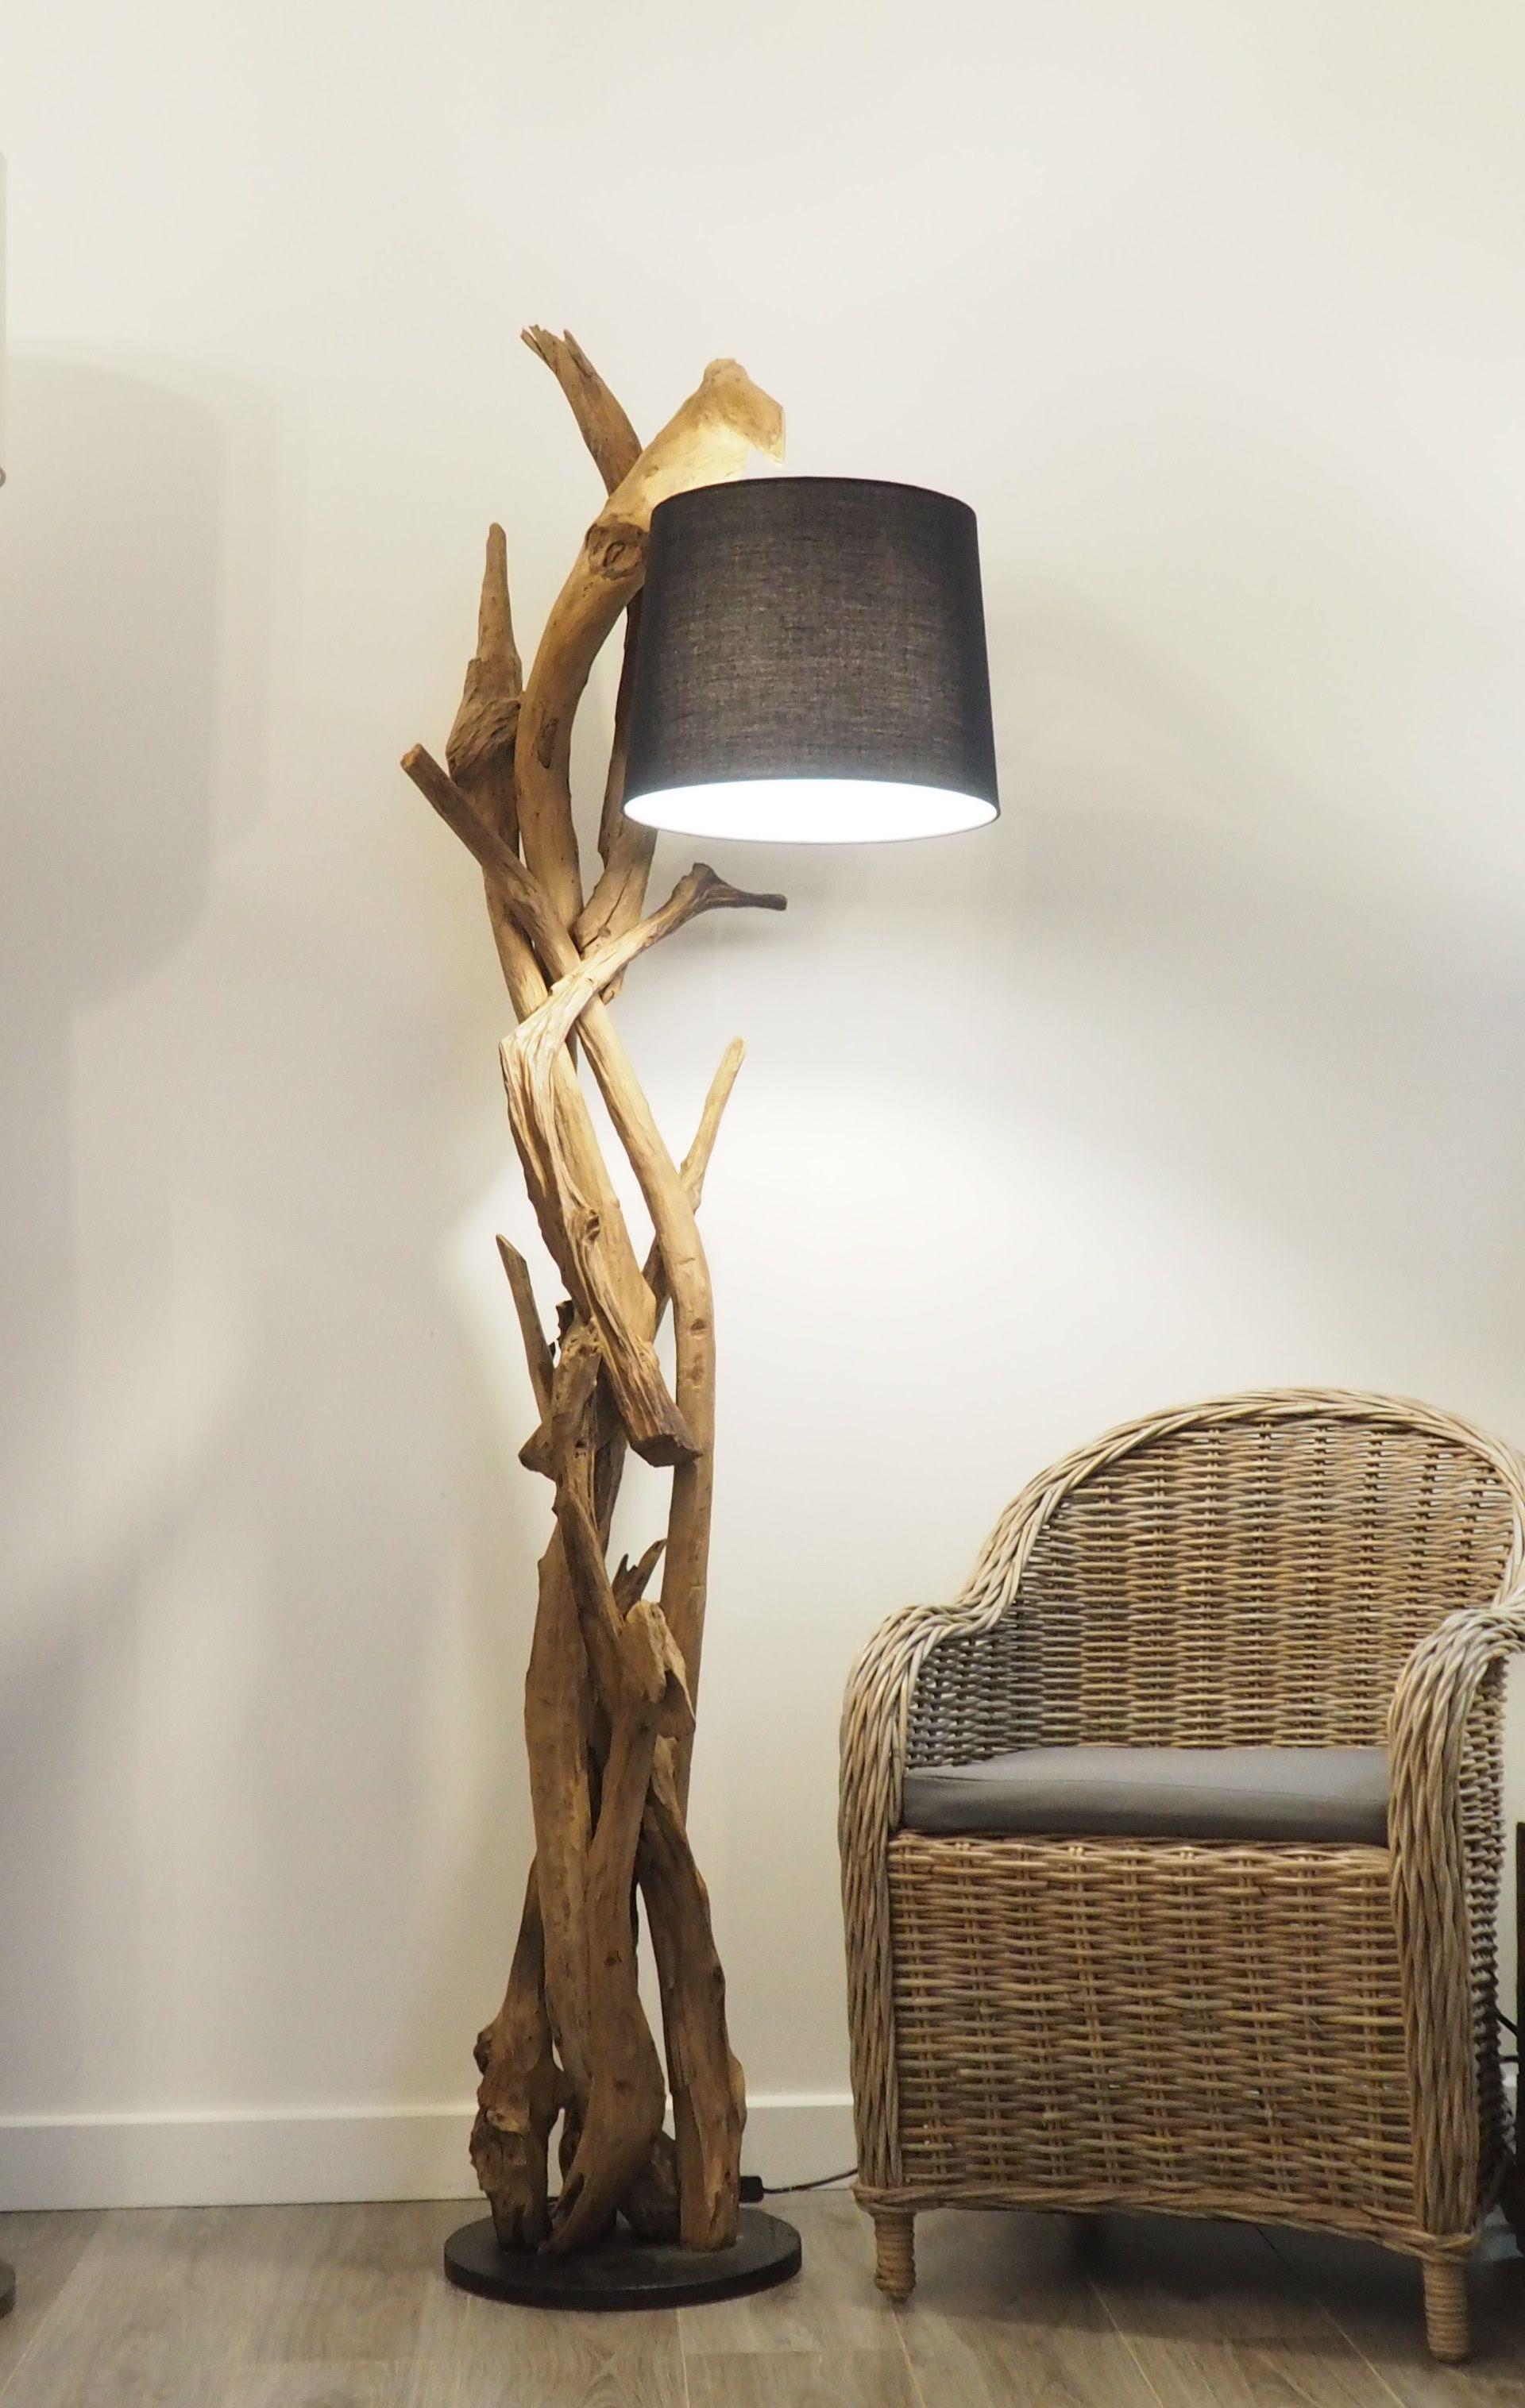 This Impressive Tubular Floor Lamp Is Made Up Of Rustic Teak Wood